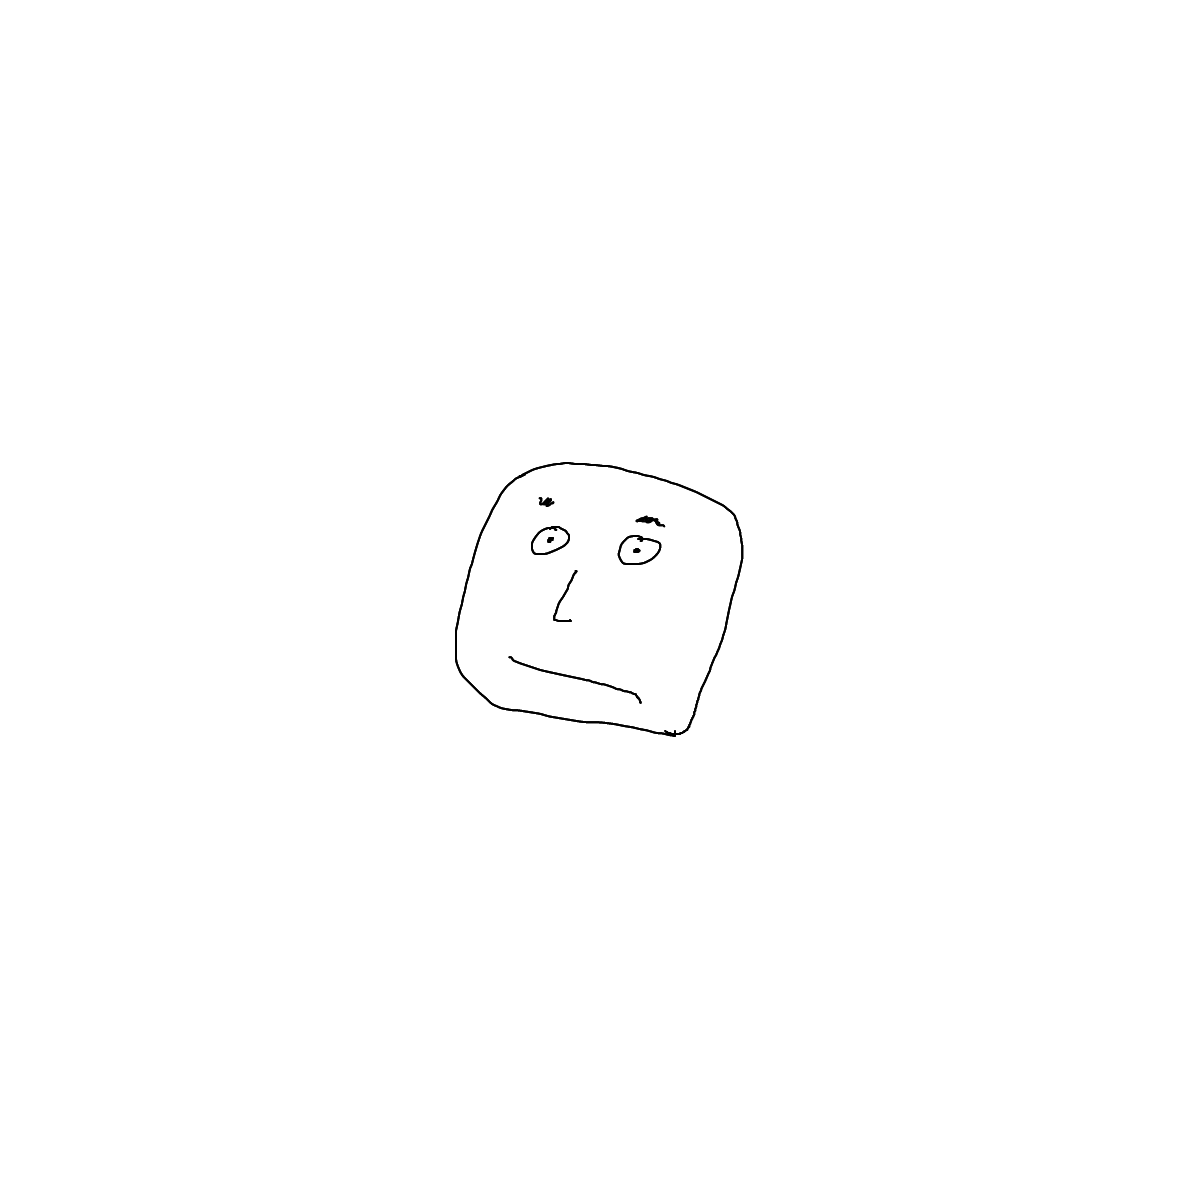 BAAAM drawing#48 lat:52.4751319885253900lng: 13.4067401885986330